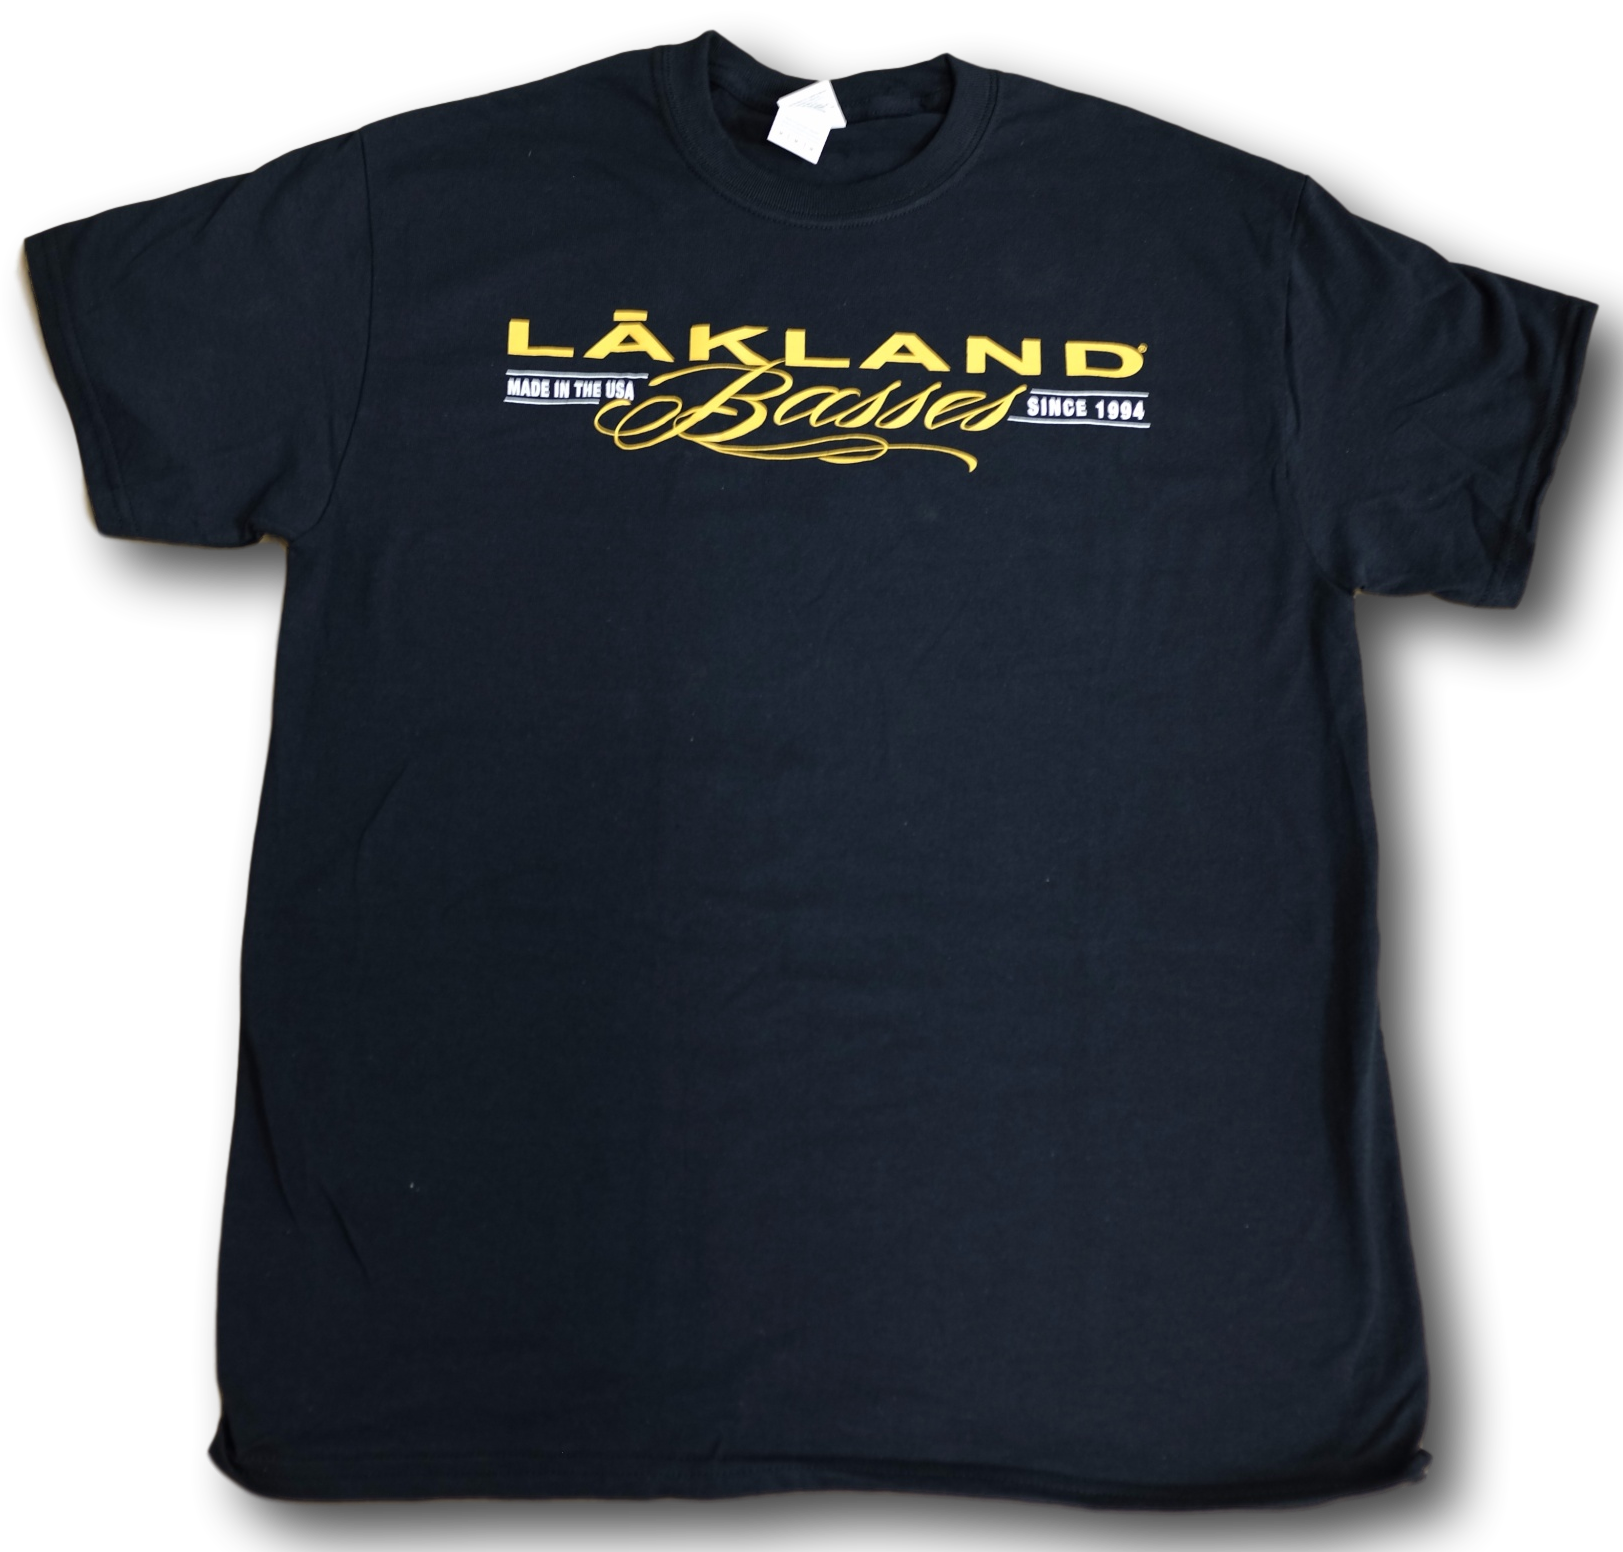 Lakland t-shirt